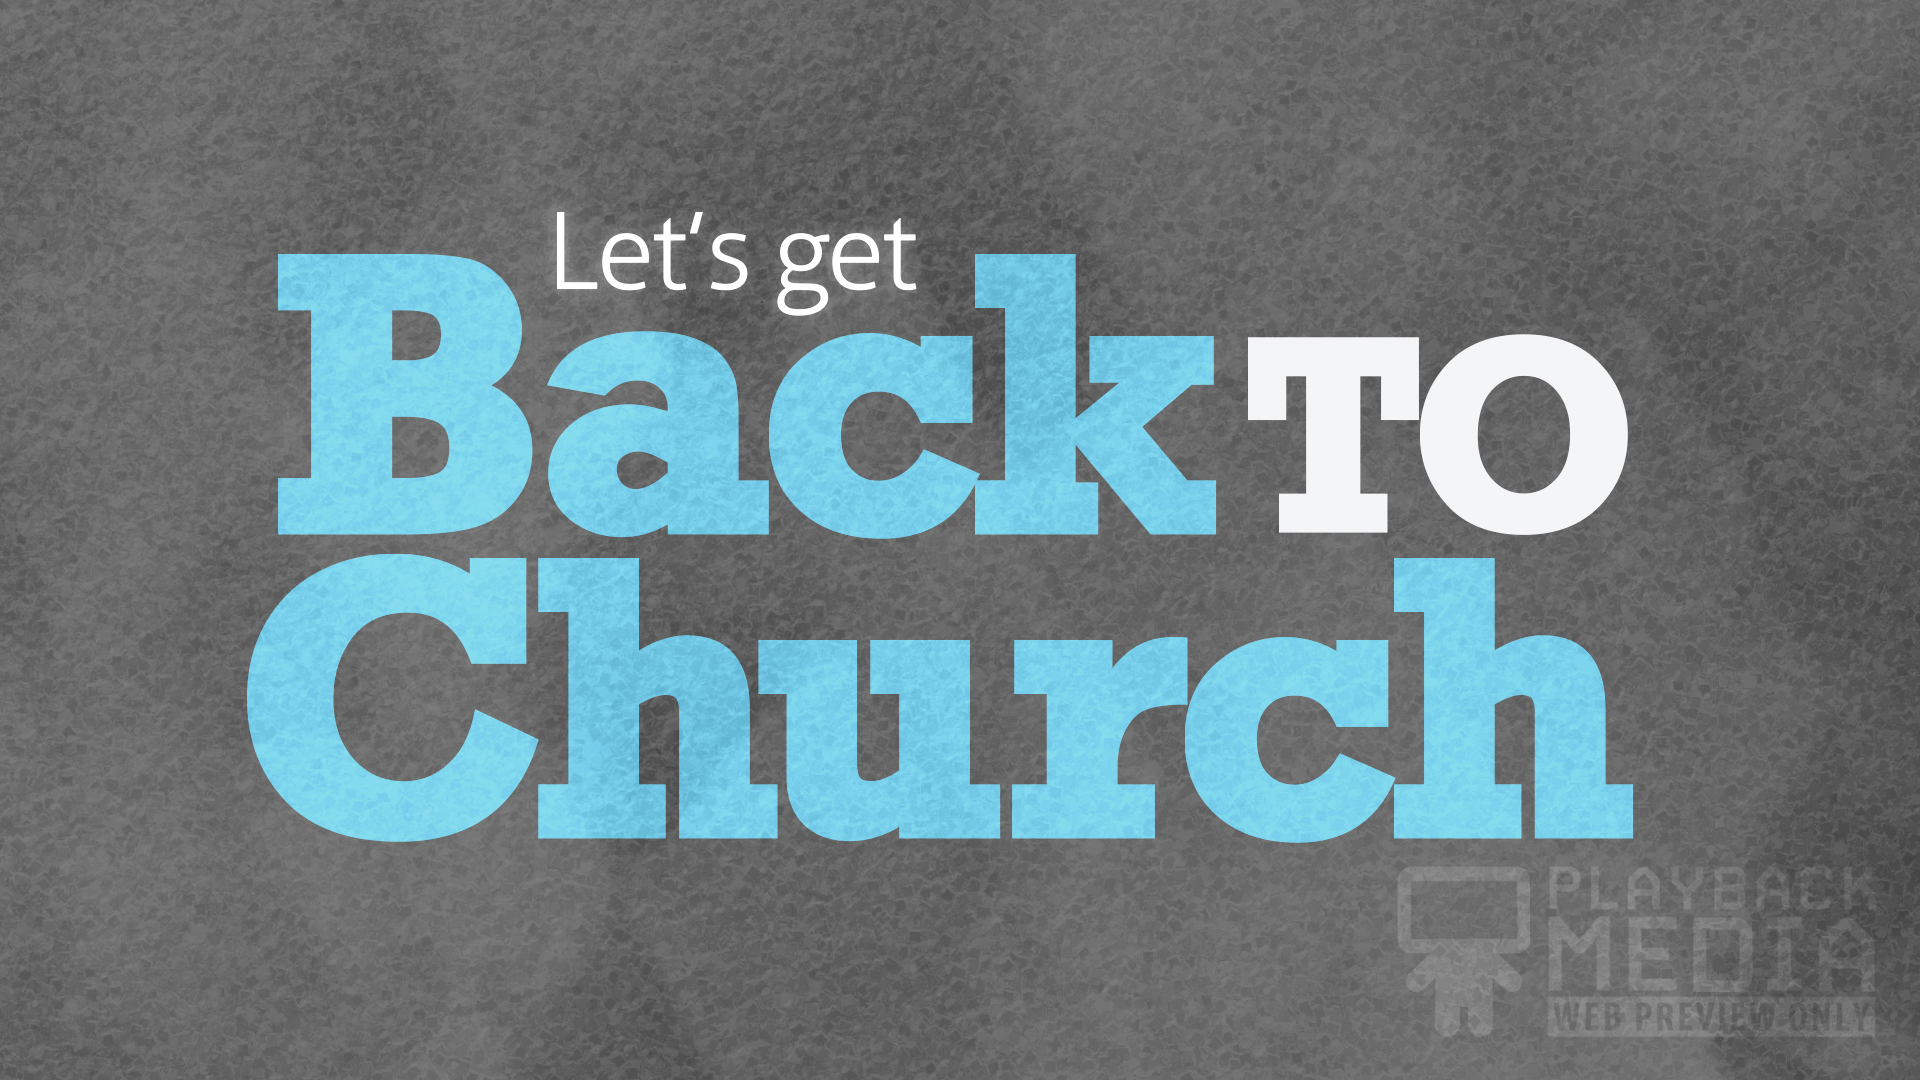 bold impression back to church motion background